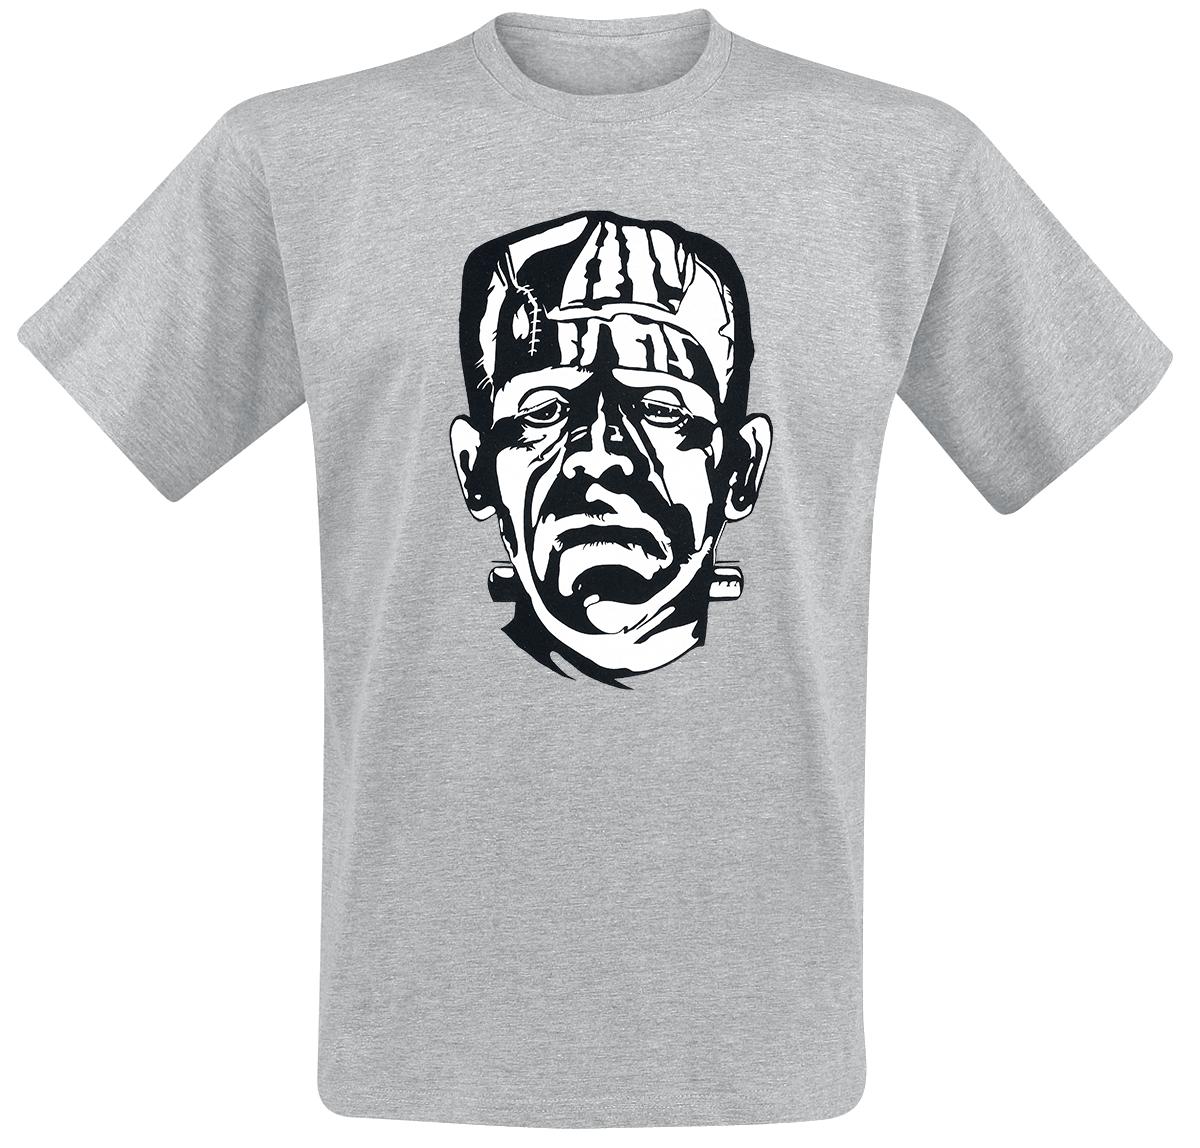 Frankenstein - Face - T-Shirt - mottled grey image